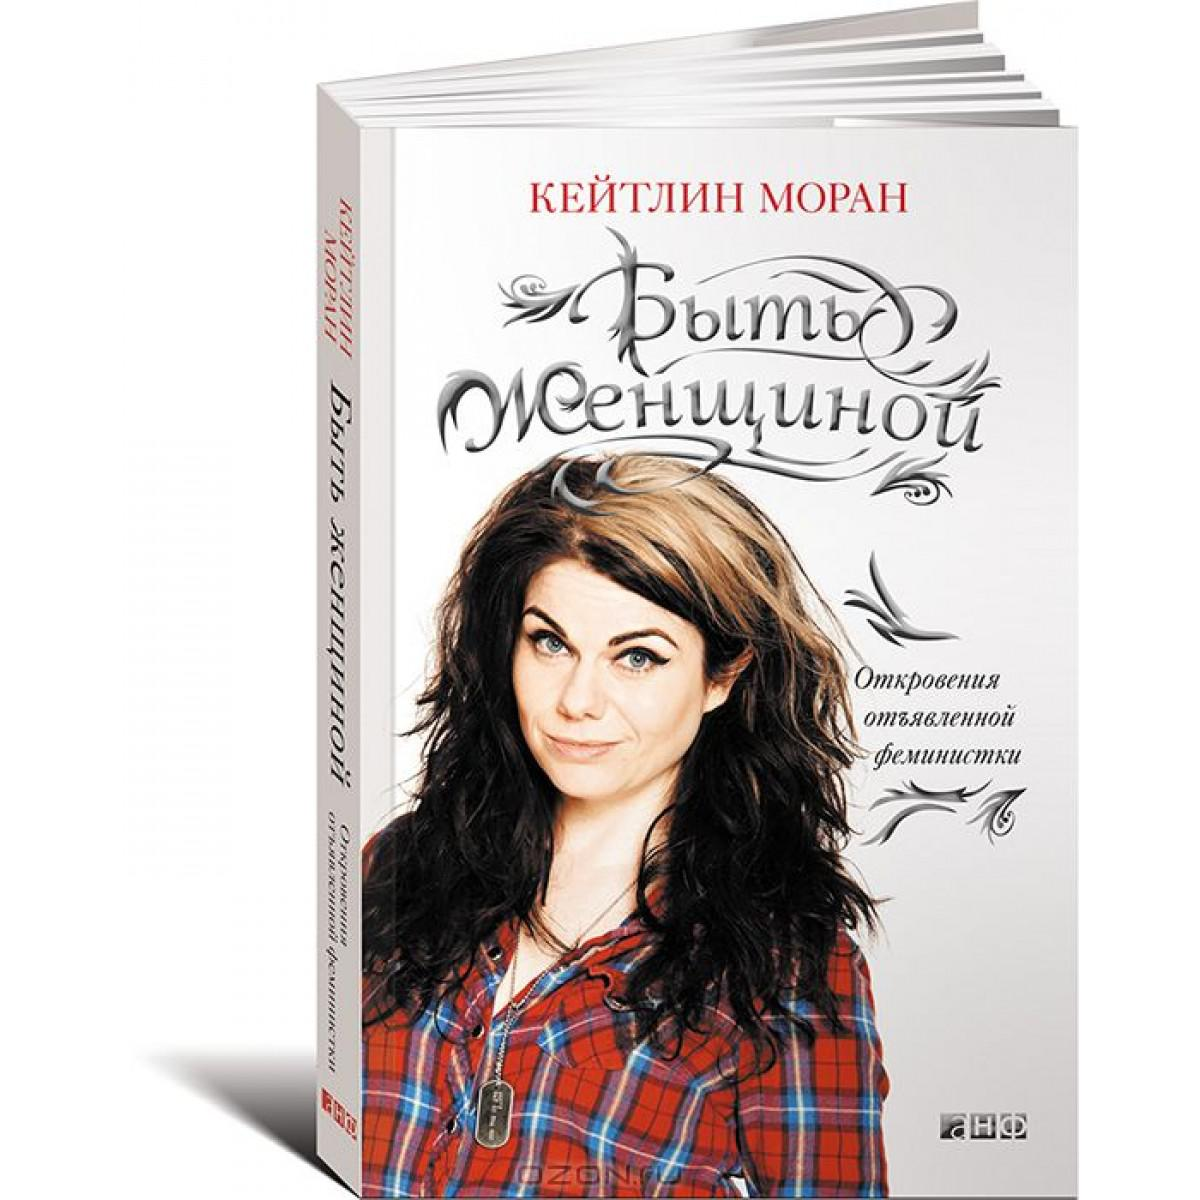 multimediabooks_covers1010459555